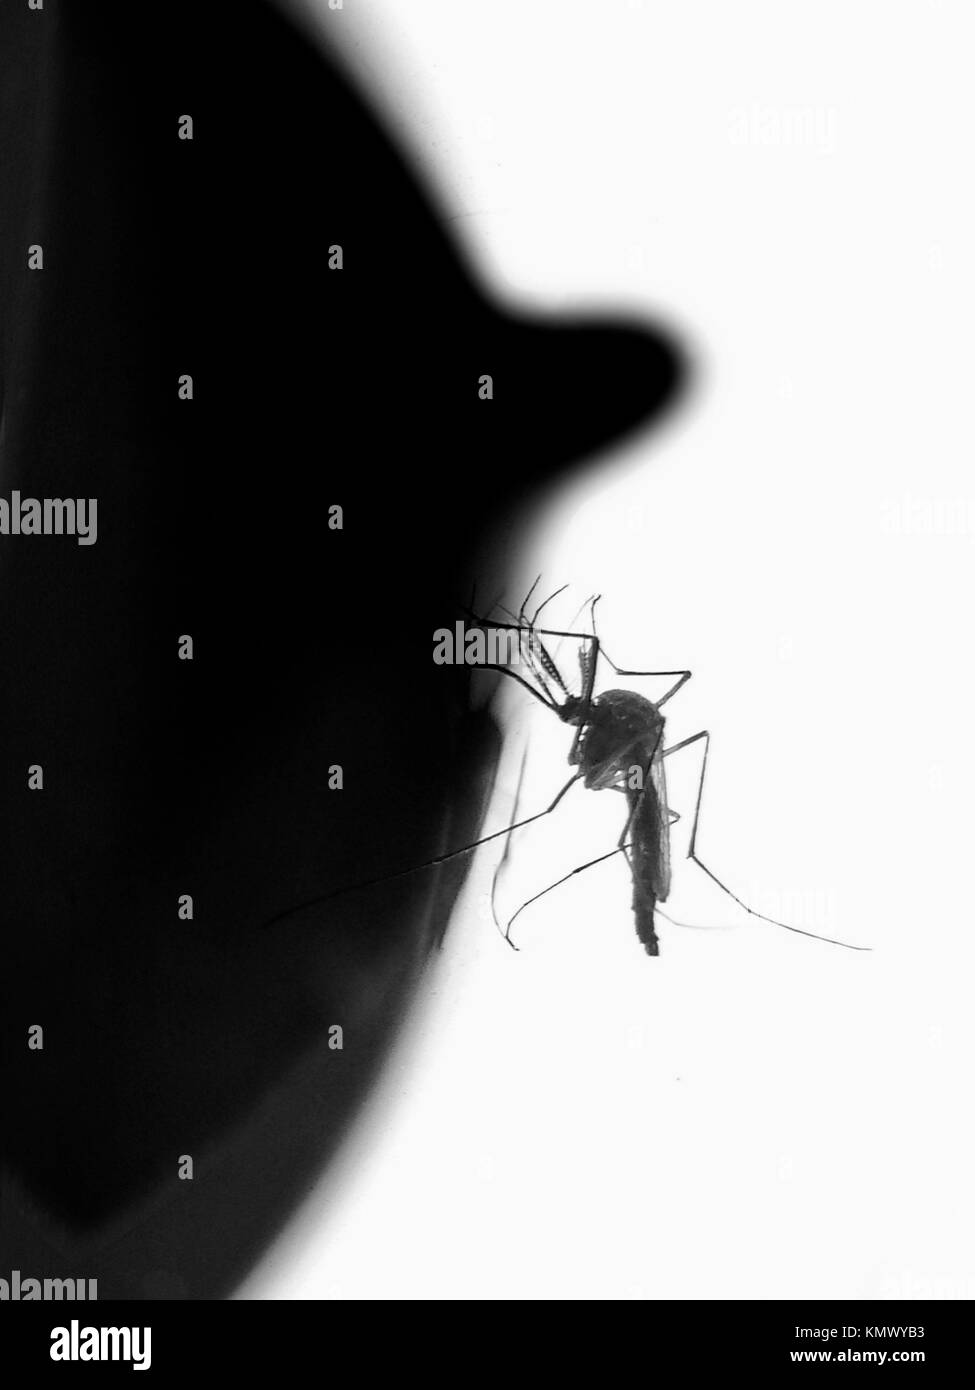 Mosquito - Stock Image